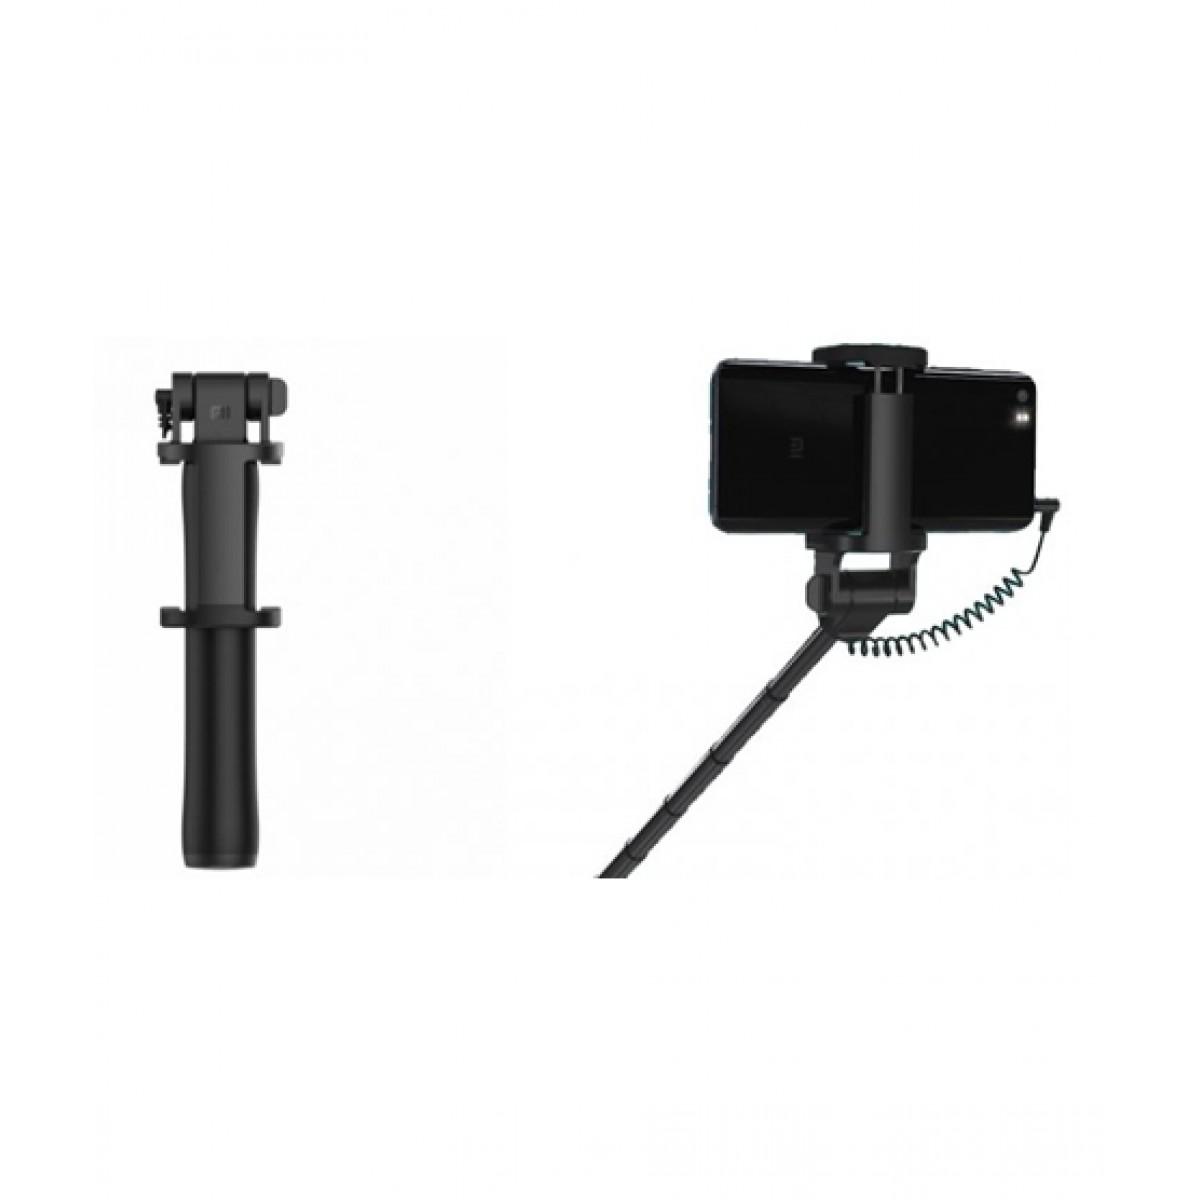 Xiaomi Mi Tripod Selfie Stick with Bluetooth Remote Control Black